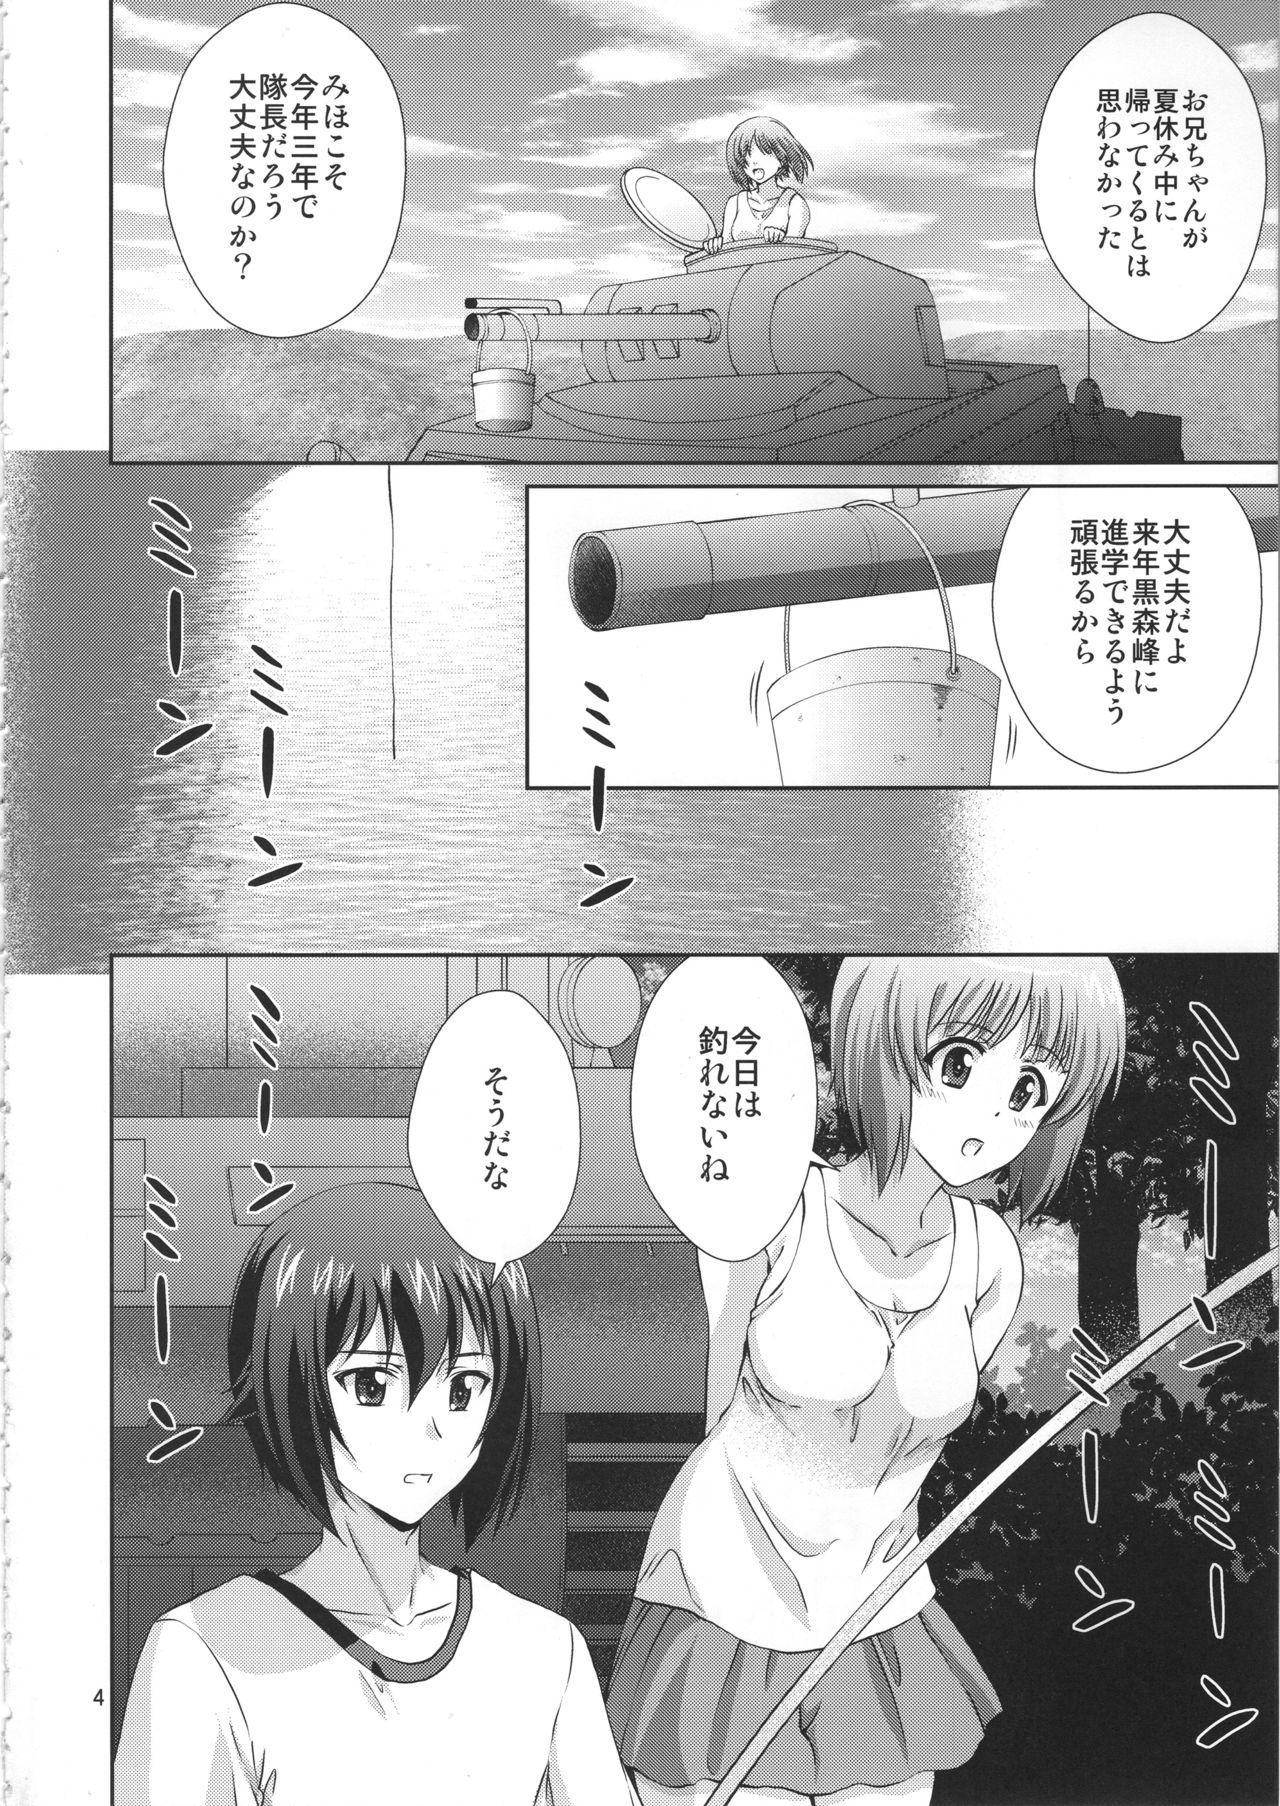 Onii-chan to Issho desu! 2